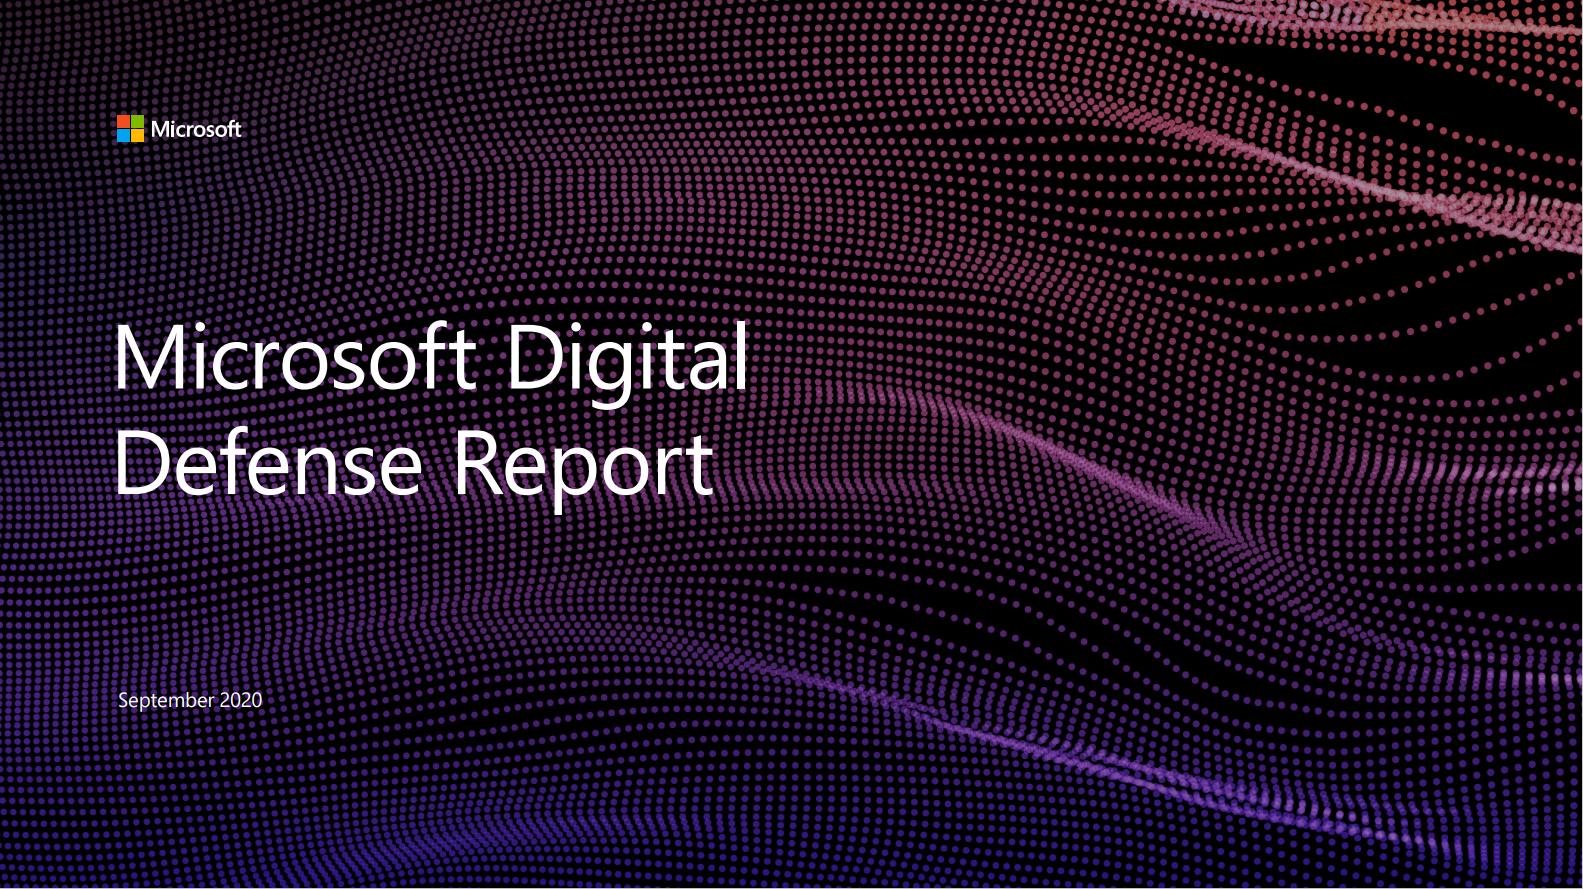 Microsoft Digital Defense Report Picture